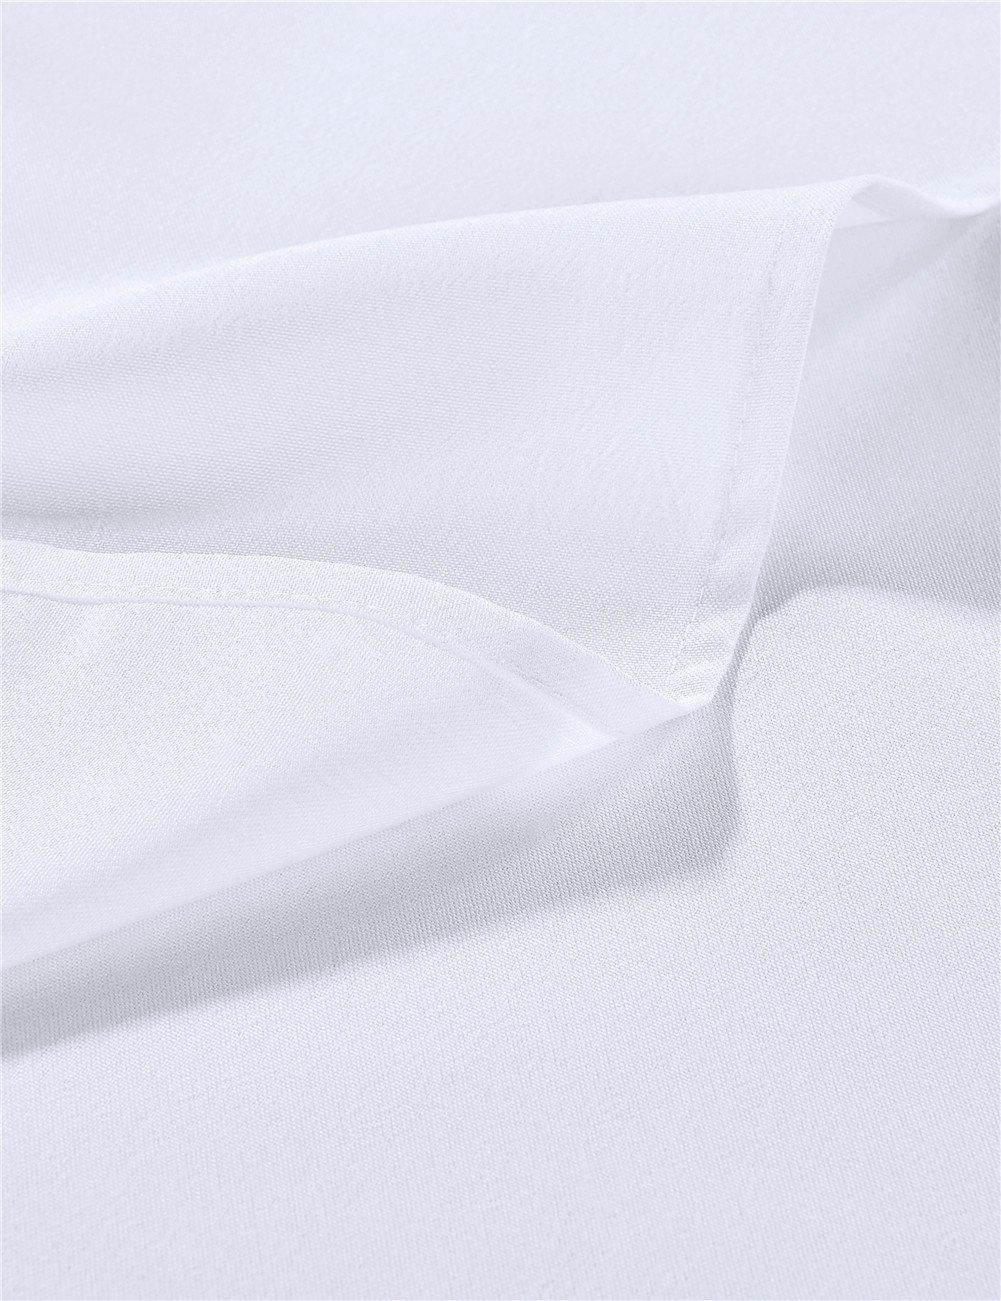 Cieltown Polyester Cloth Napkins 1-Dozen (17 x 17-Inch, white) by cieltown (Image #4)